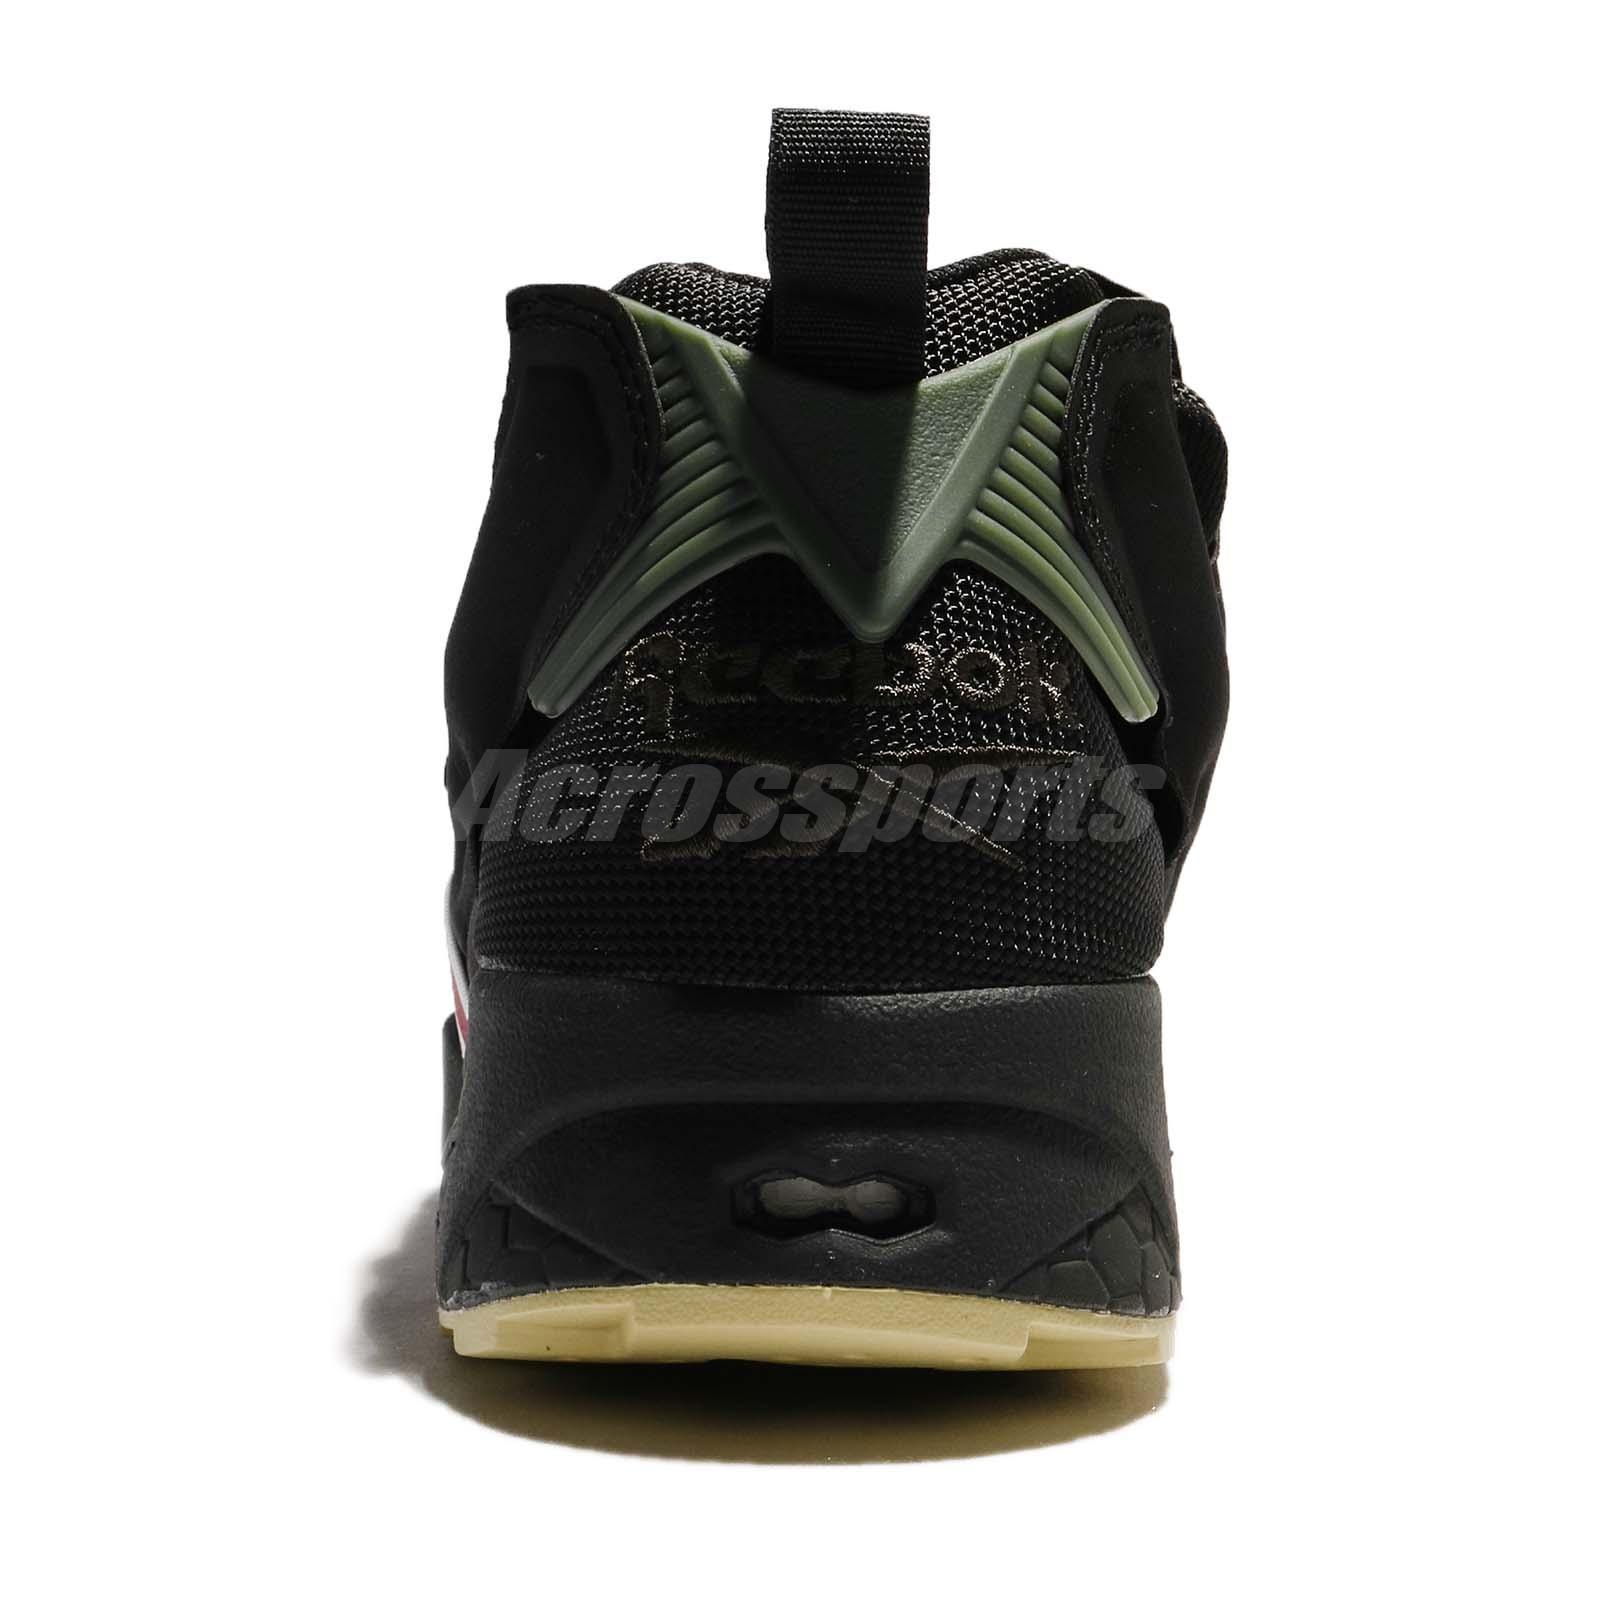 cafd7a6772f1 Reebok Instapump Fury OG MB Black Coal Red Men Running Shoes ...